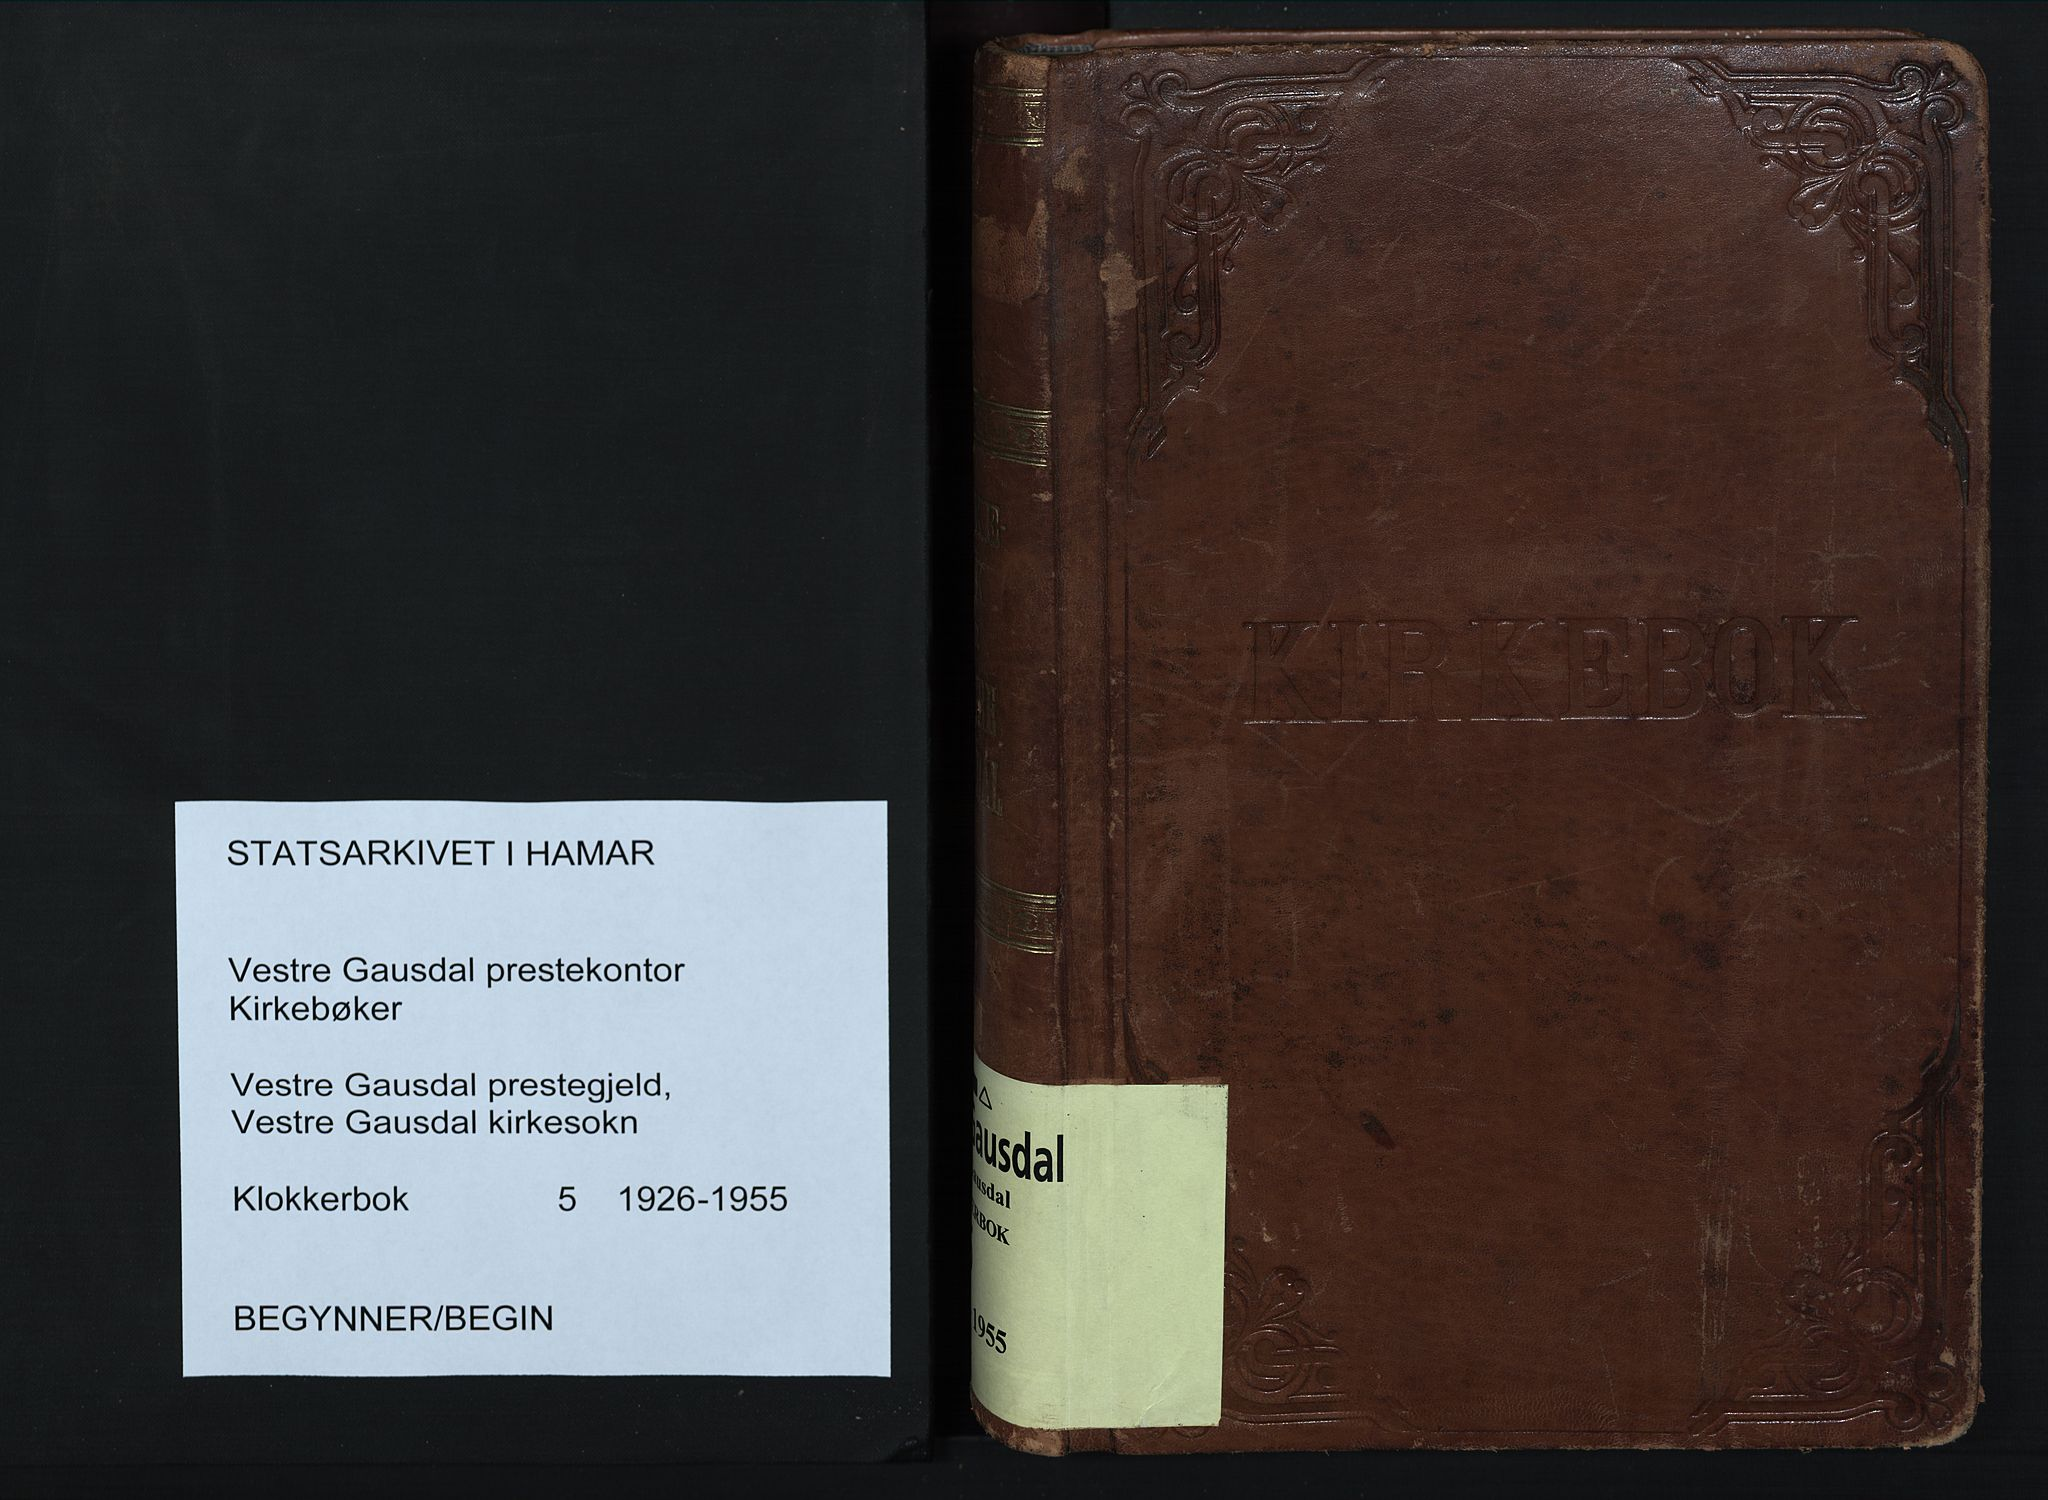 SAH, Vestre Gausdal prestekontor, Klokkerbok nr. 5, 1926-1955